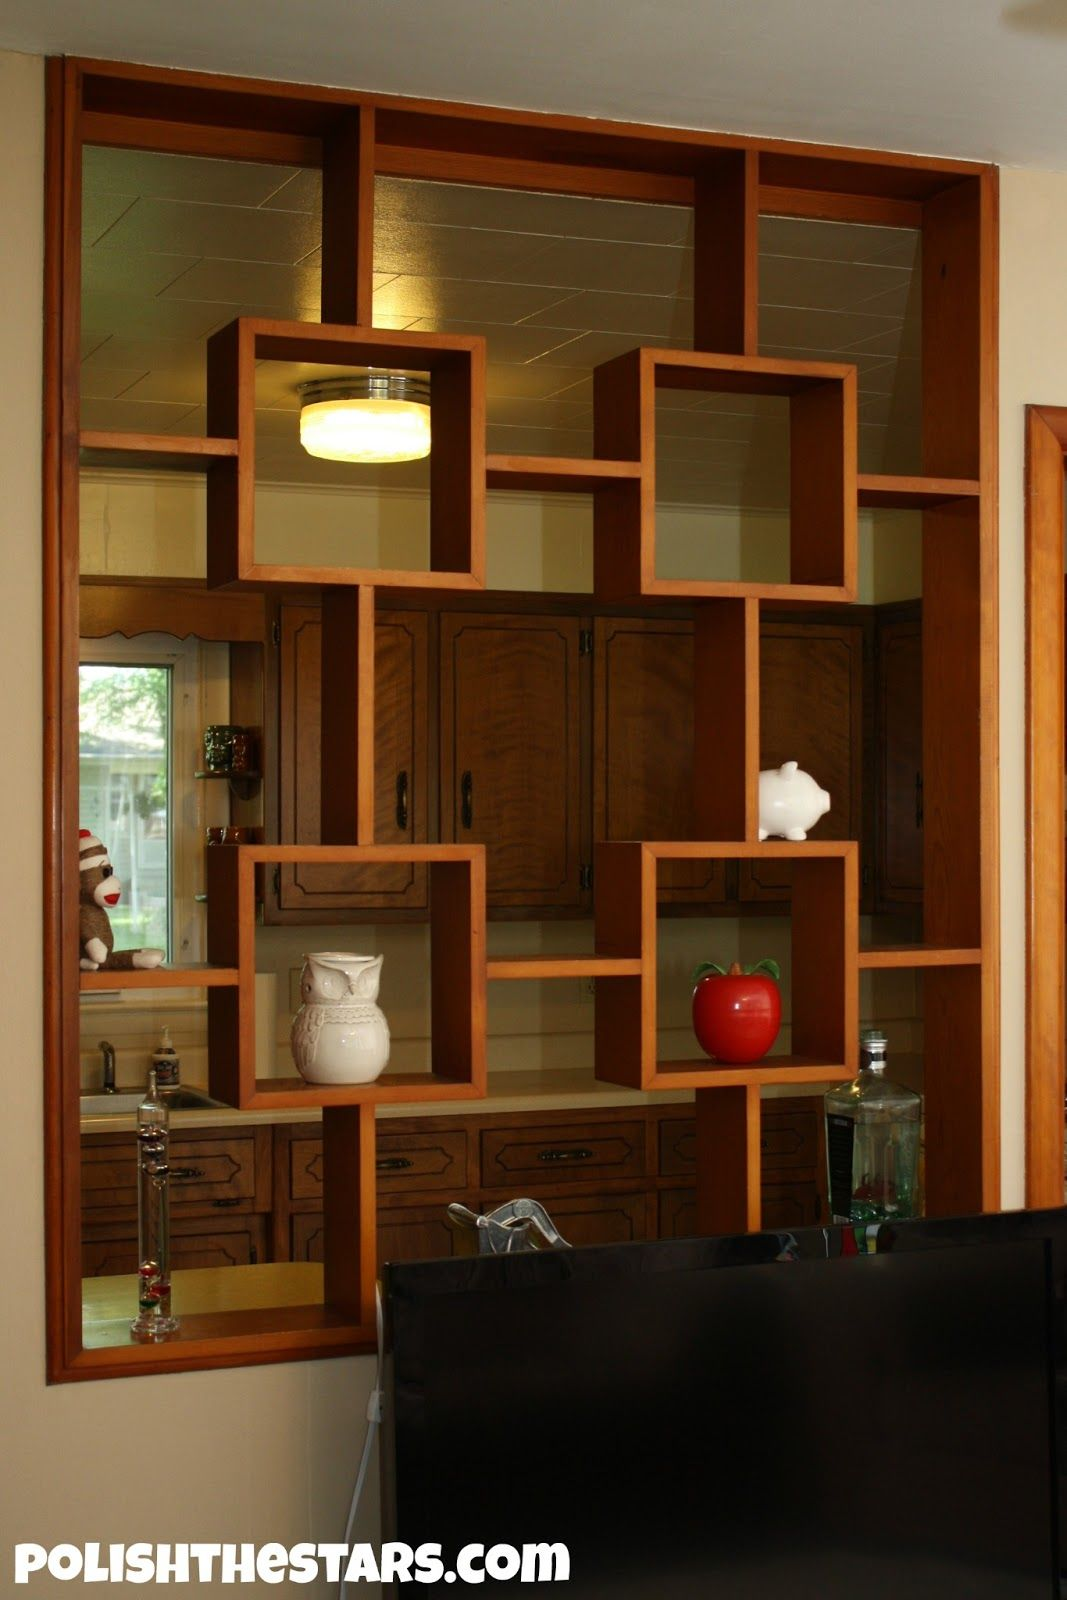 Fascinating Half Wall Room Divider For Interior Design: Home